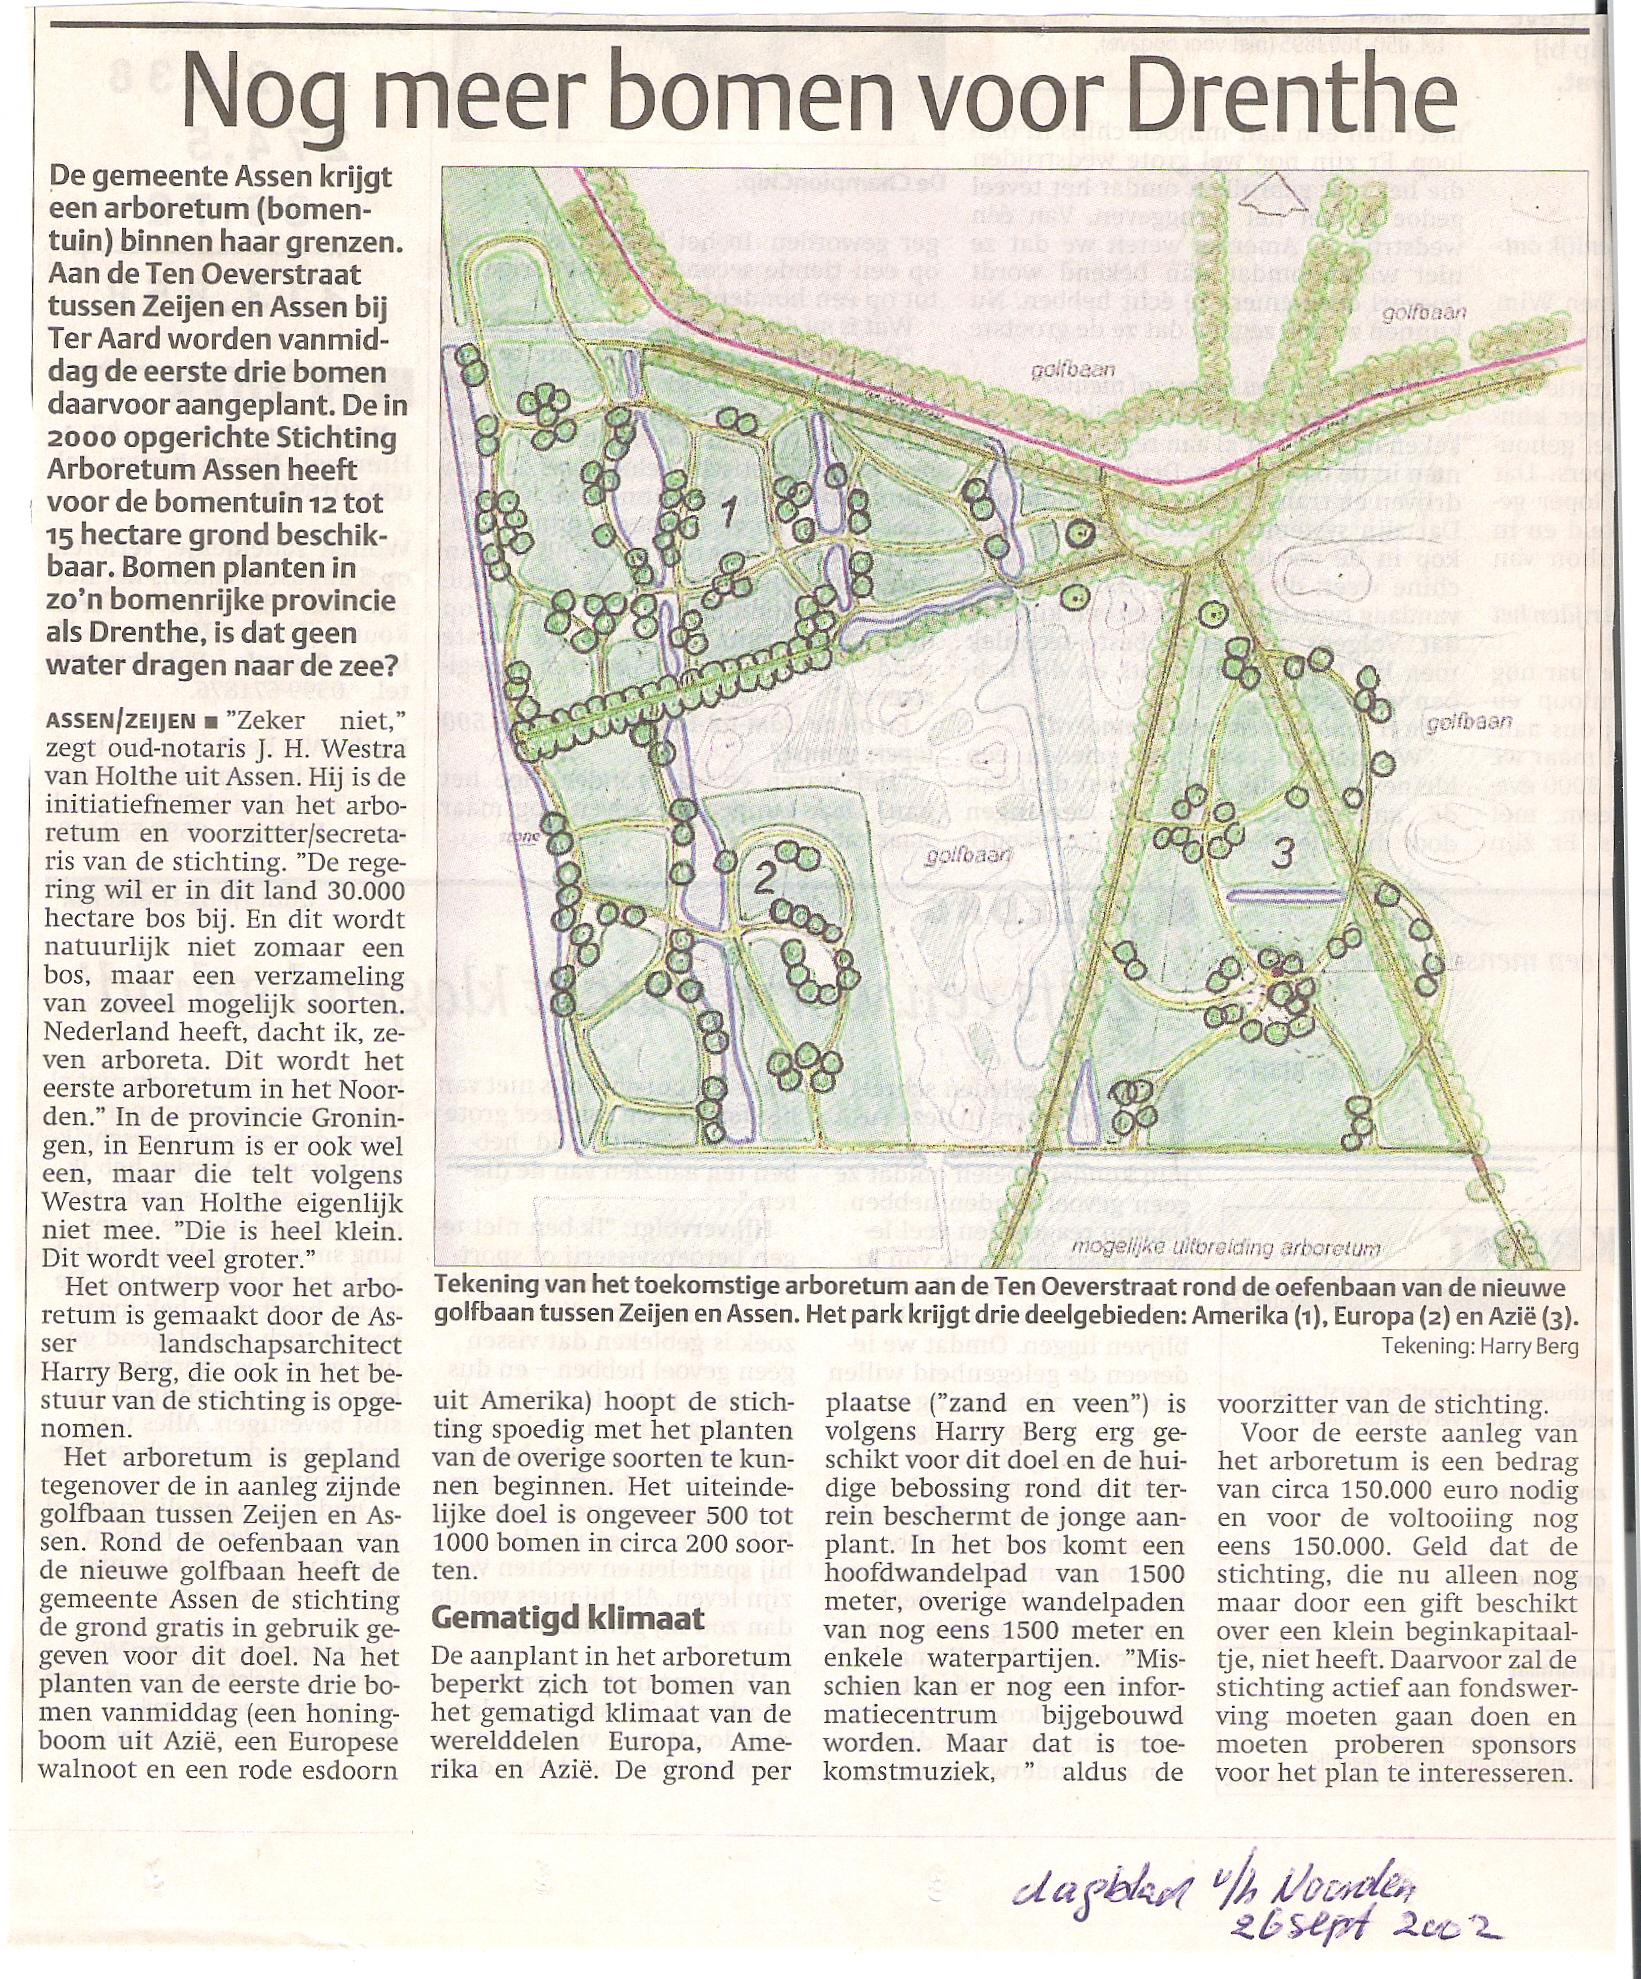 krantenartikel 2002